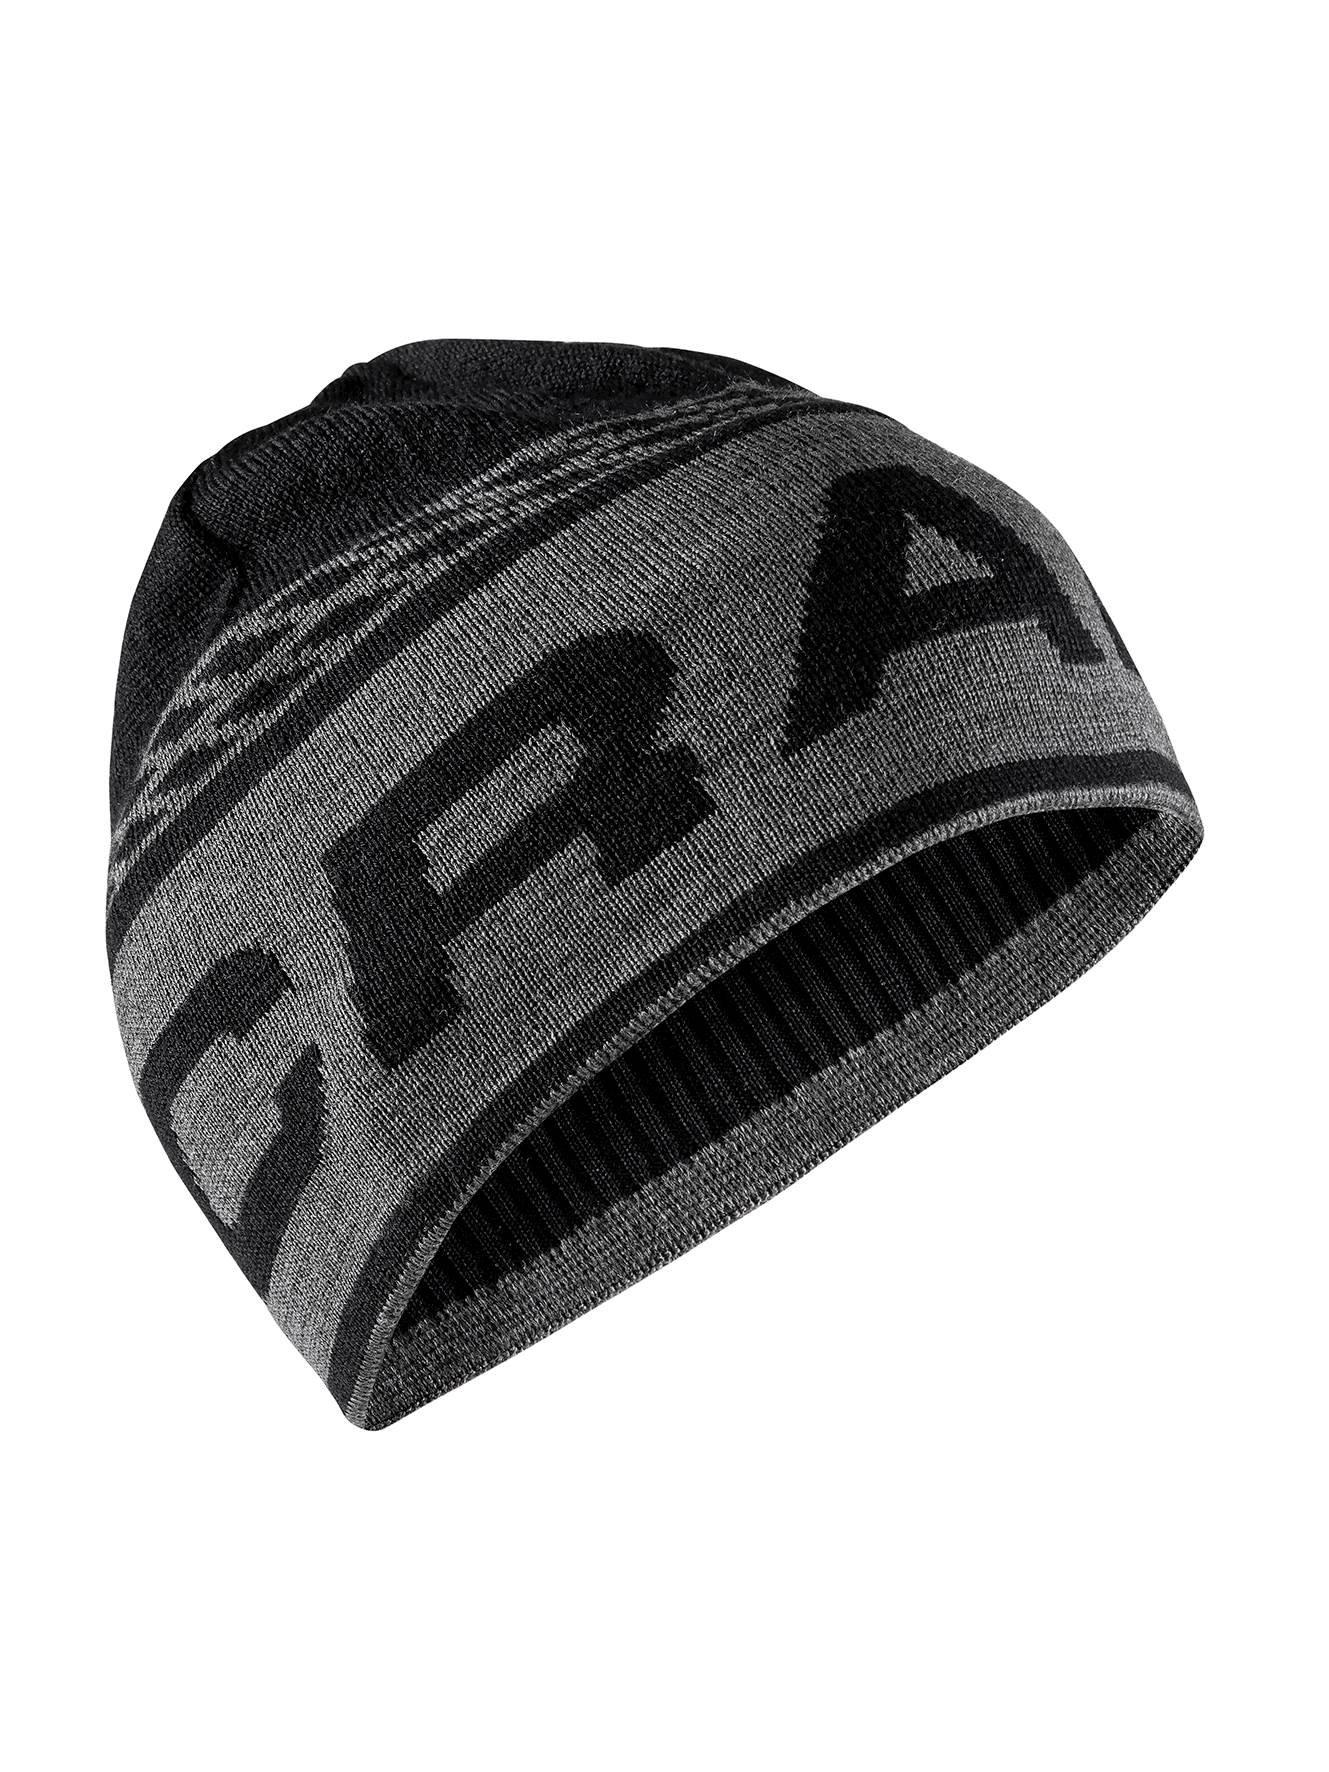 8692fb7c7e4 Adidas cepice cepice knit logo cerna